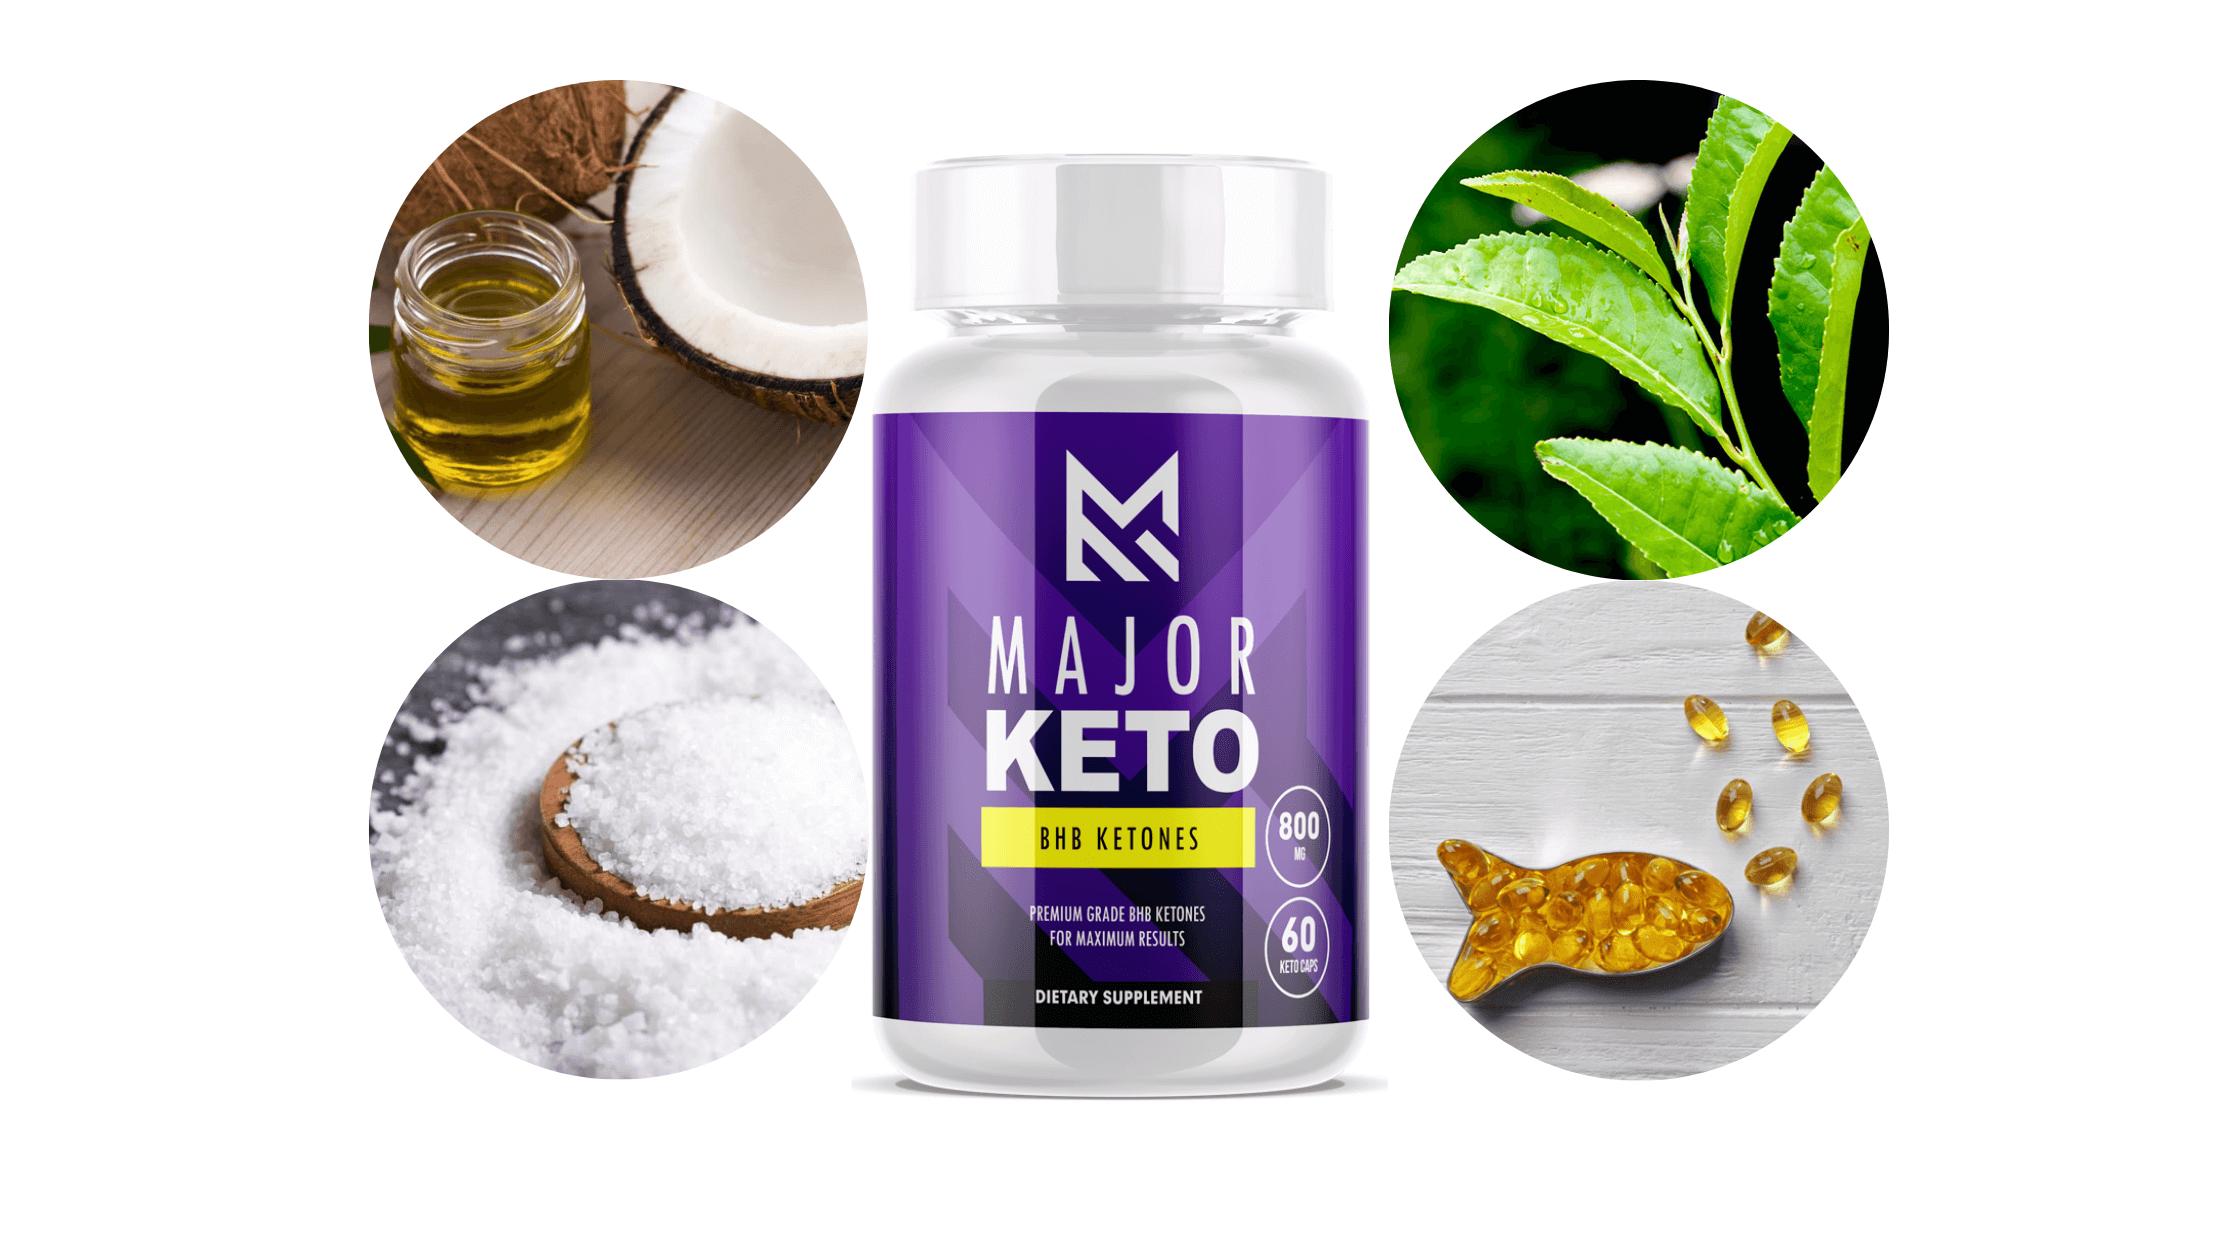 Major Keto Reviews Ingredients